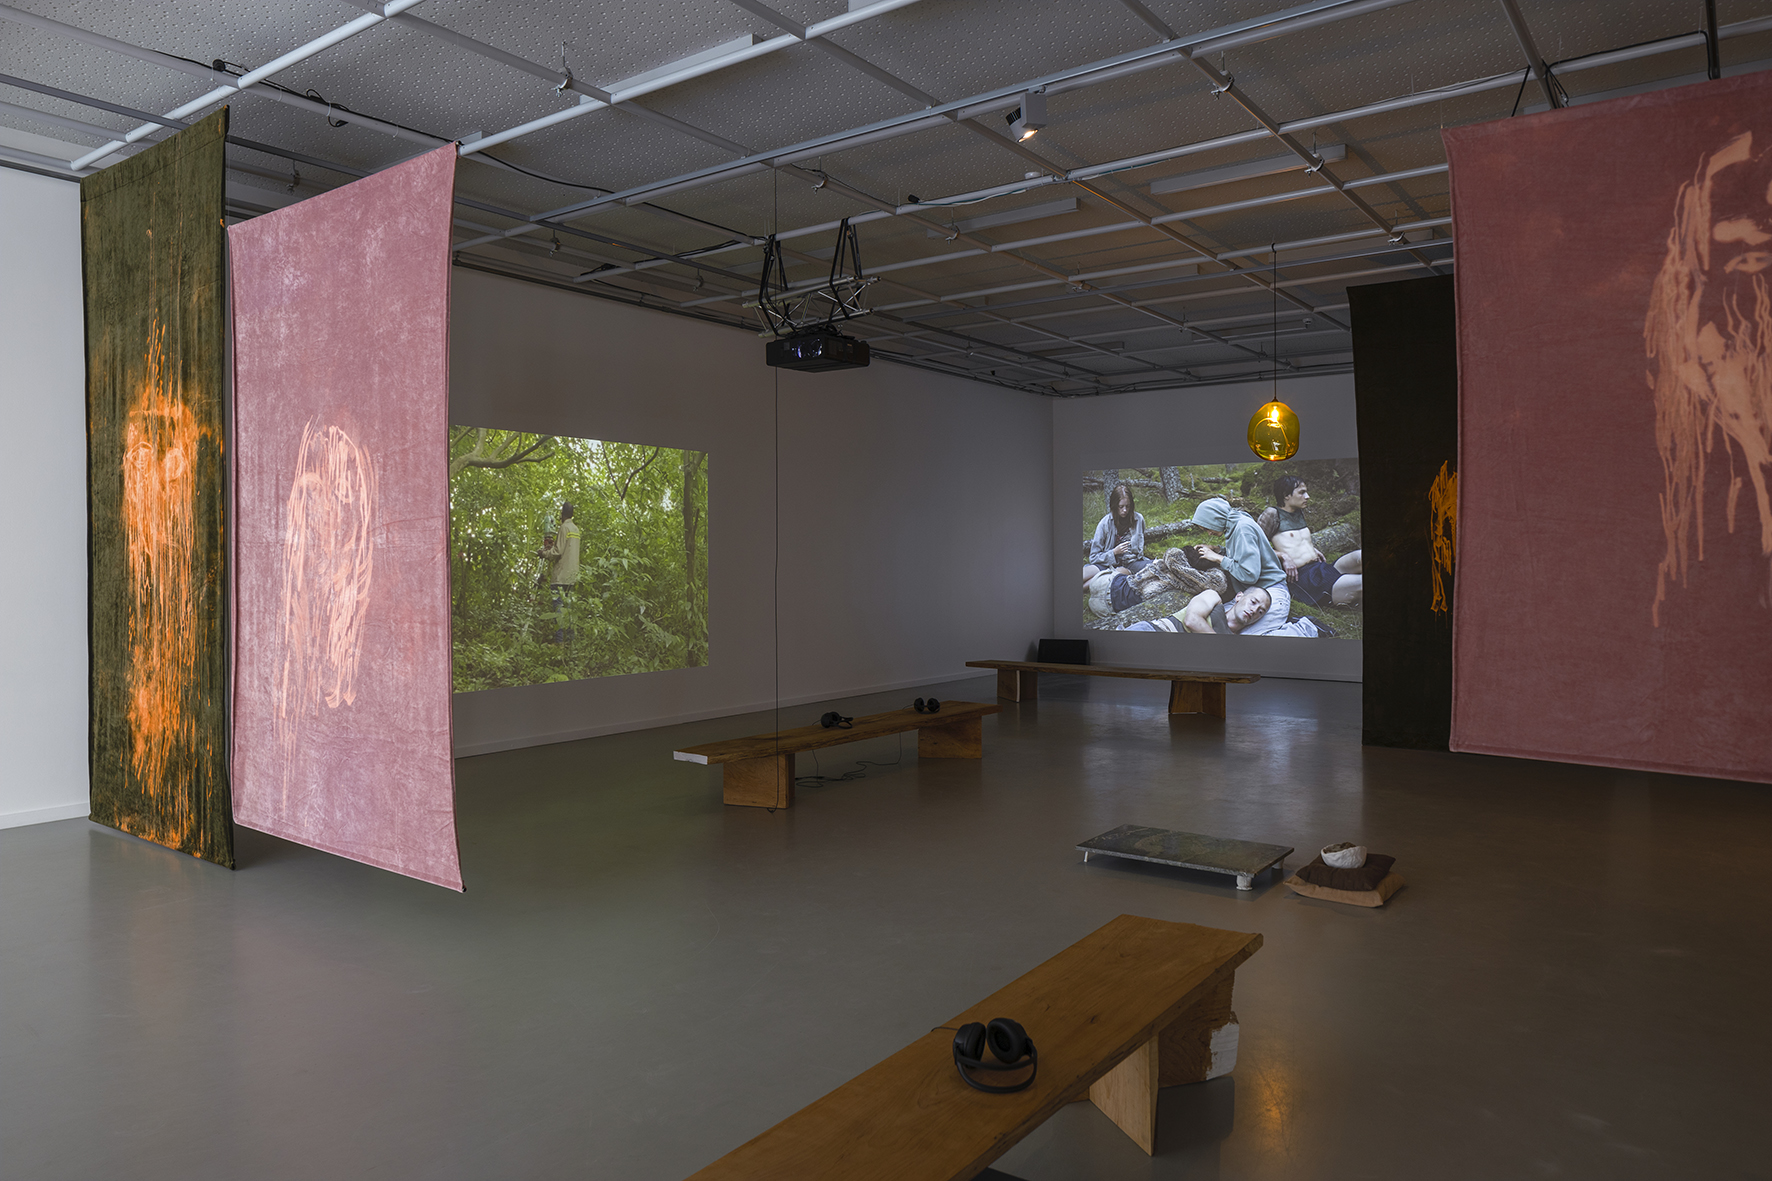 Spectral Forest_Nida Art Colony_4Cs_Curator_Rado_Istok_Photo_Ansis_Starks_4_LOW